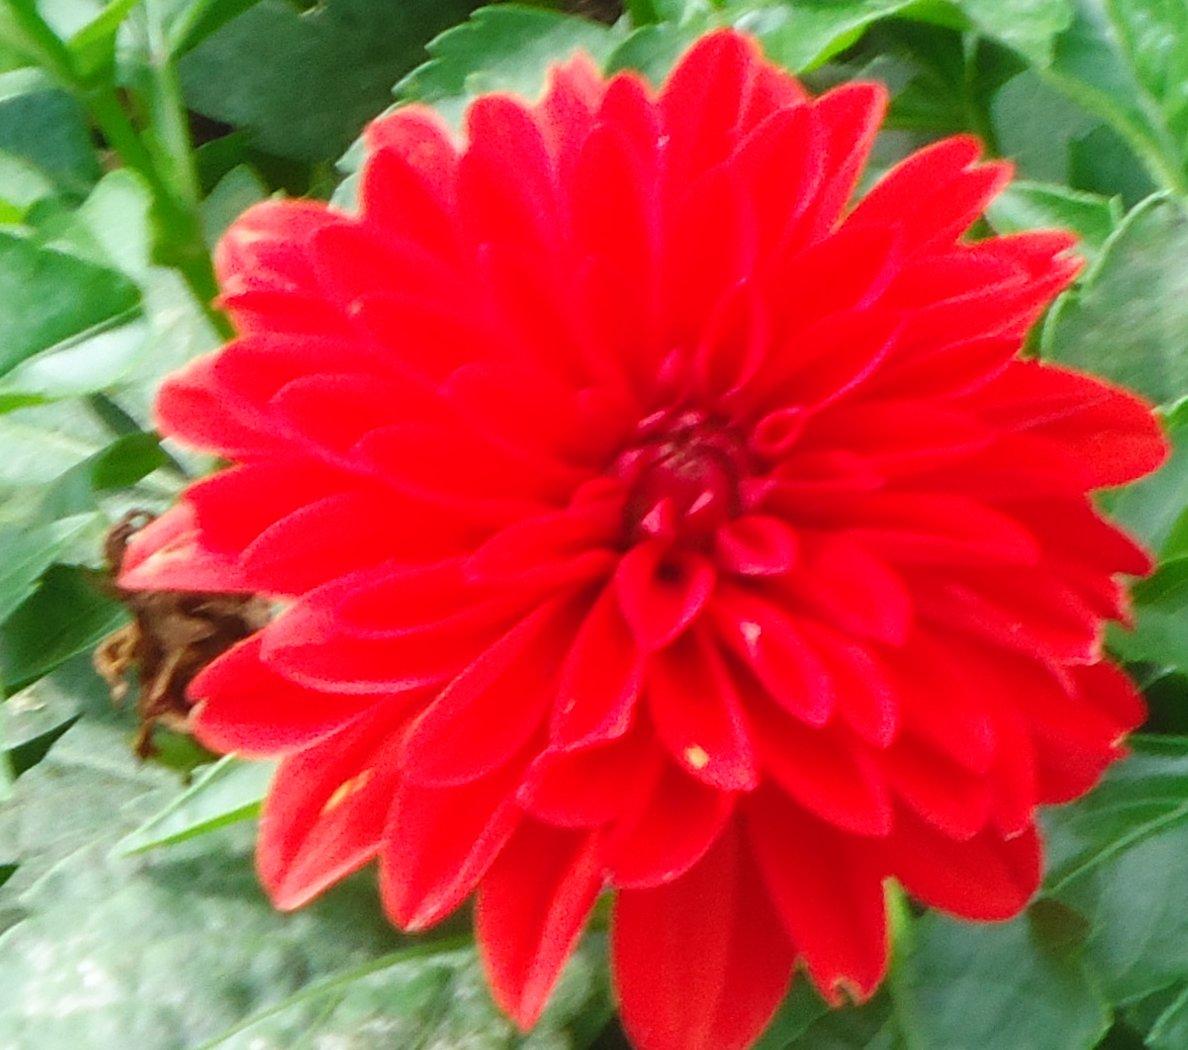 Red dahlia flower image free stock photo public domain photo free photos plants photos red dahlia flower izmirmasajfo